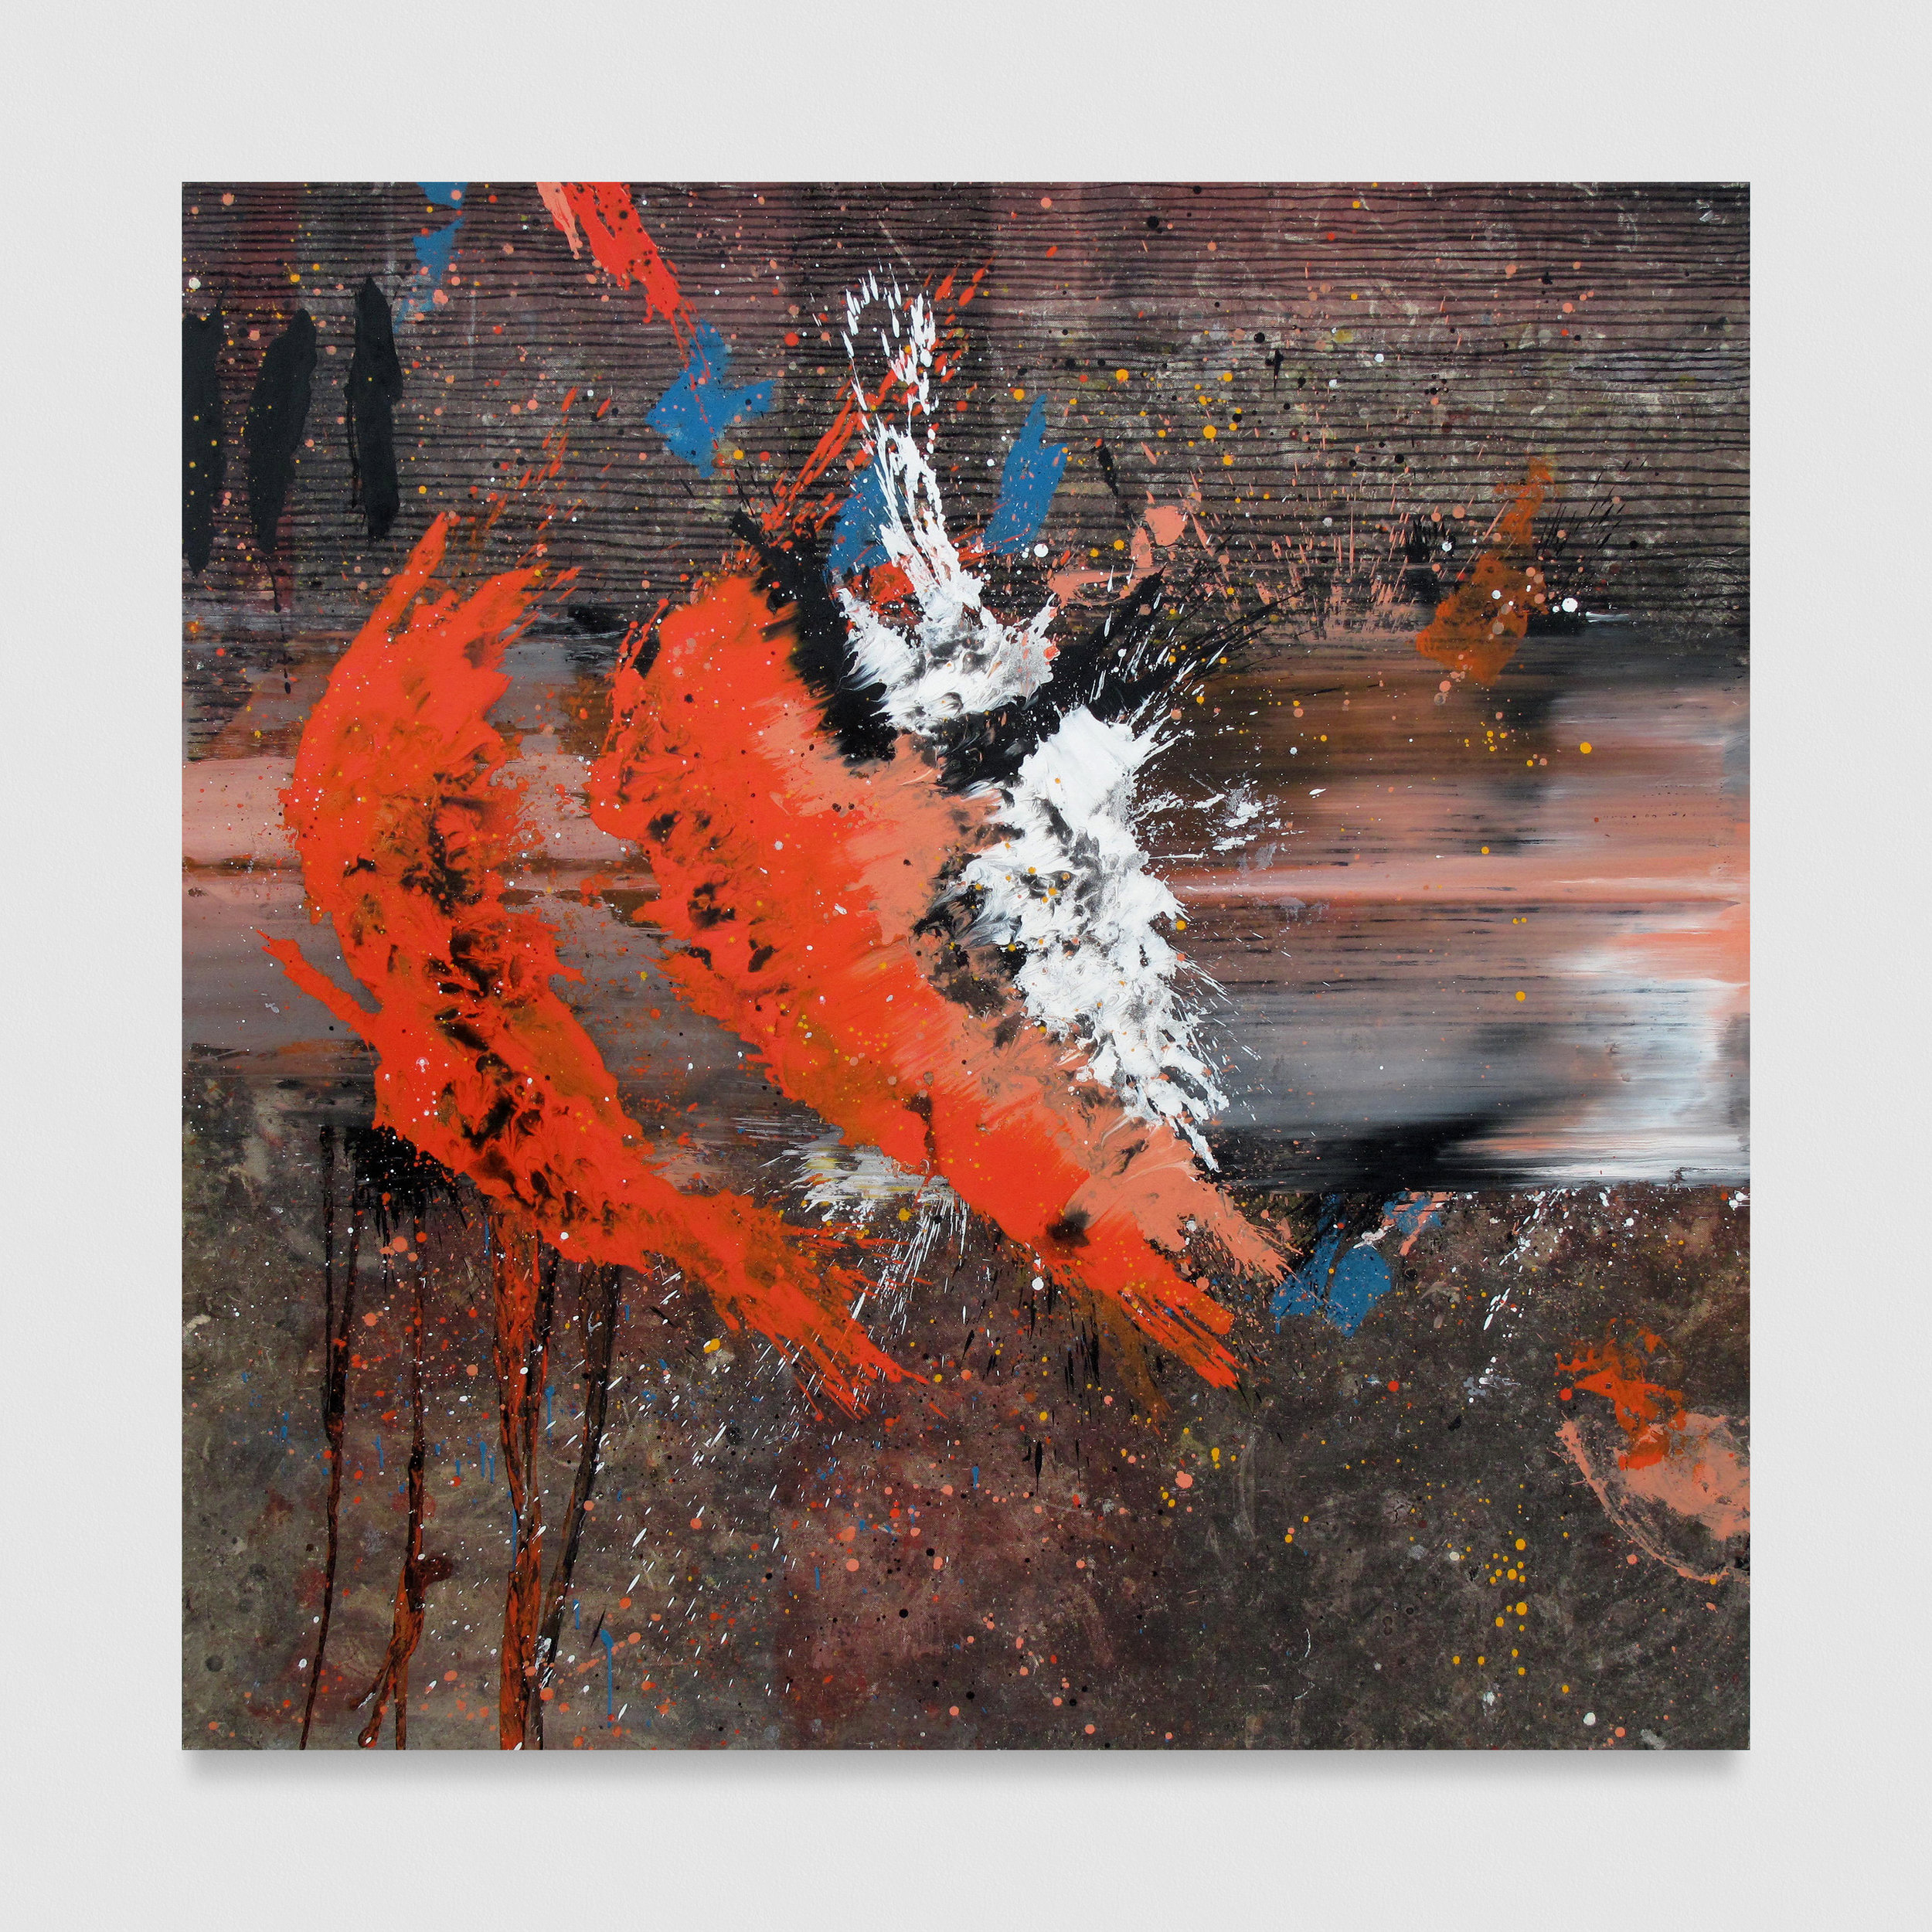 Trembling , José Manuel Ciria, 2016-2017. Image courtesy Baert Gallery.